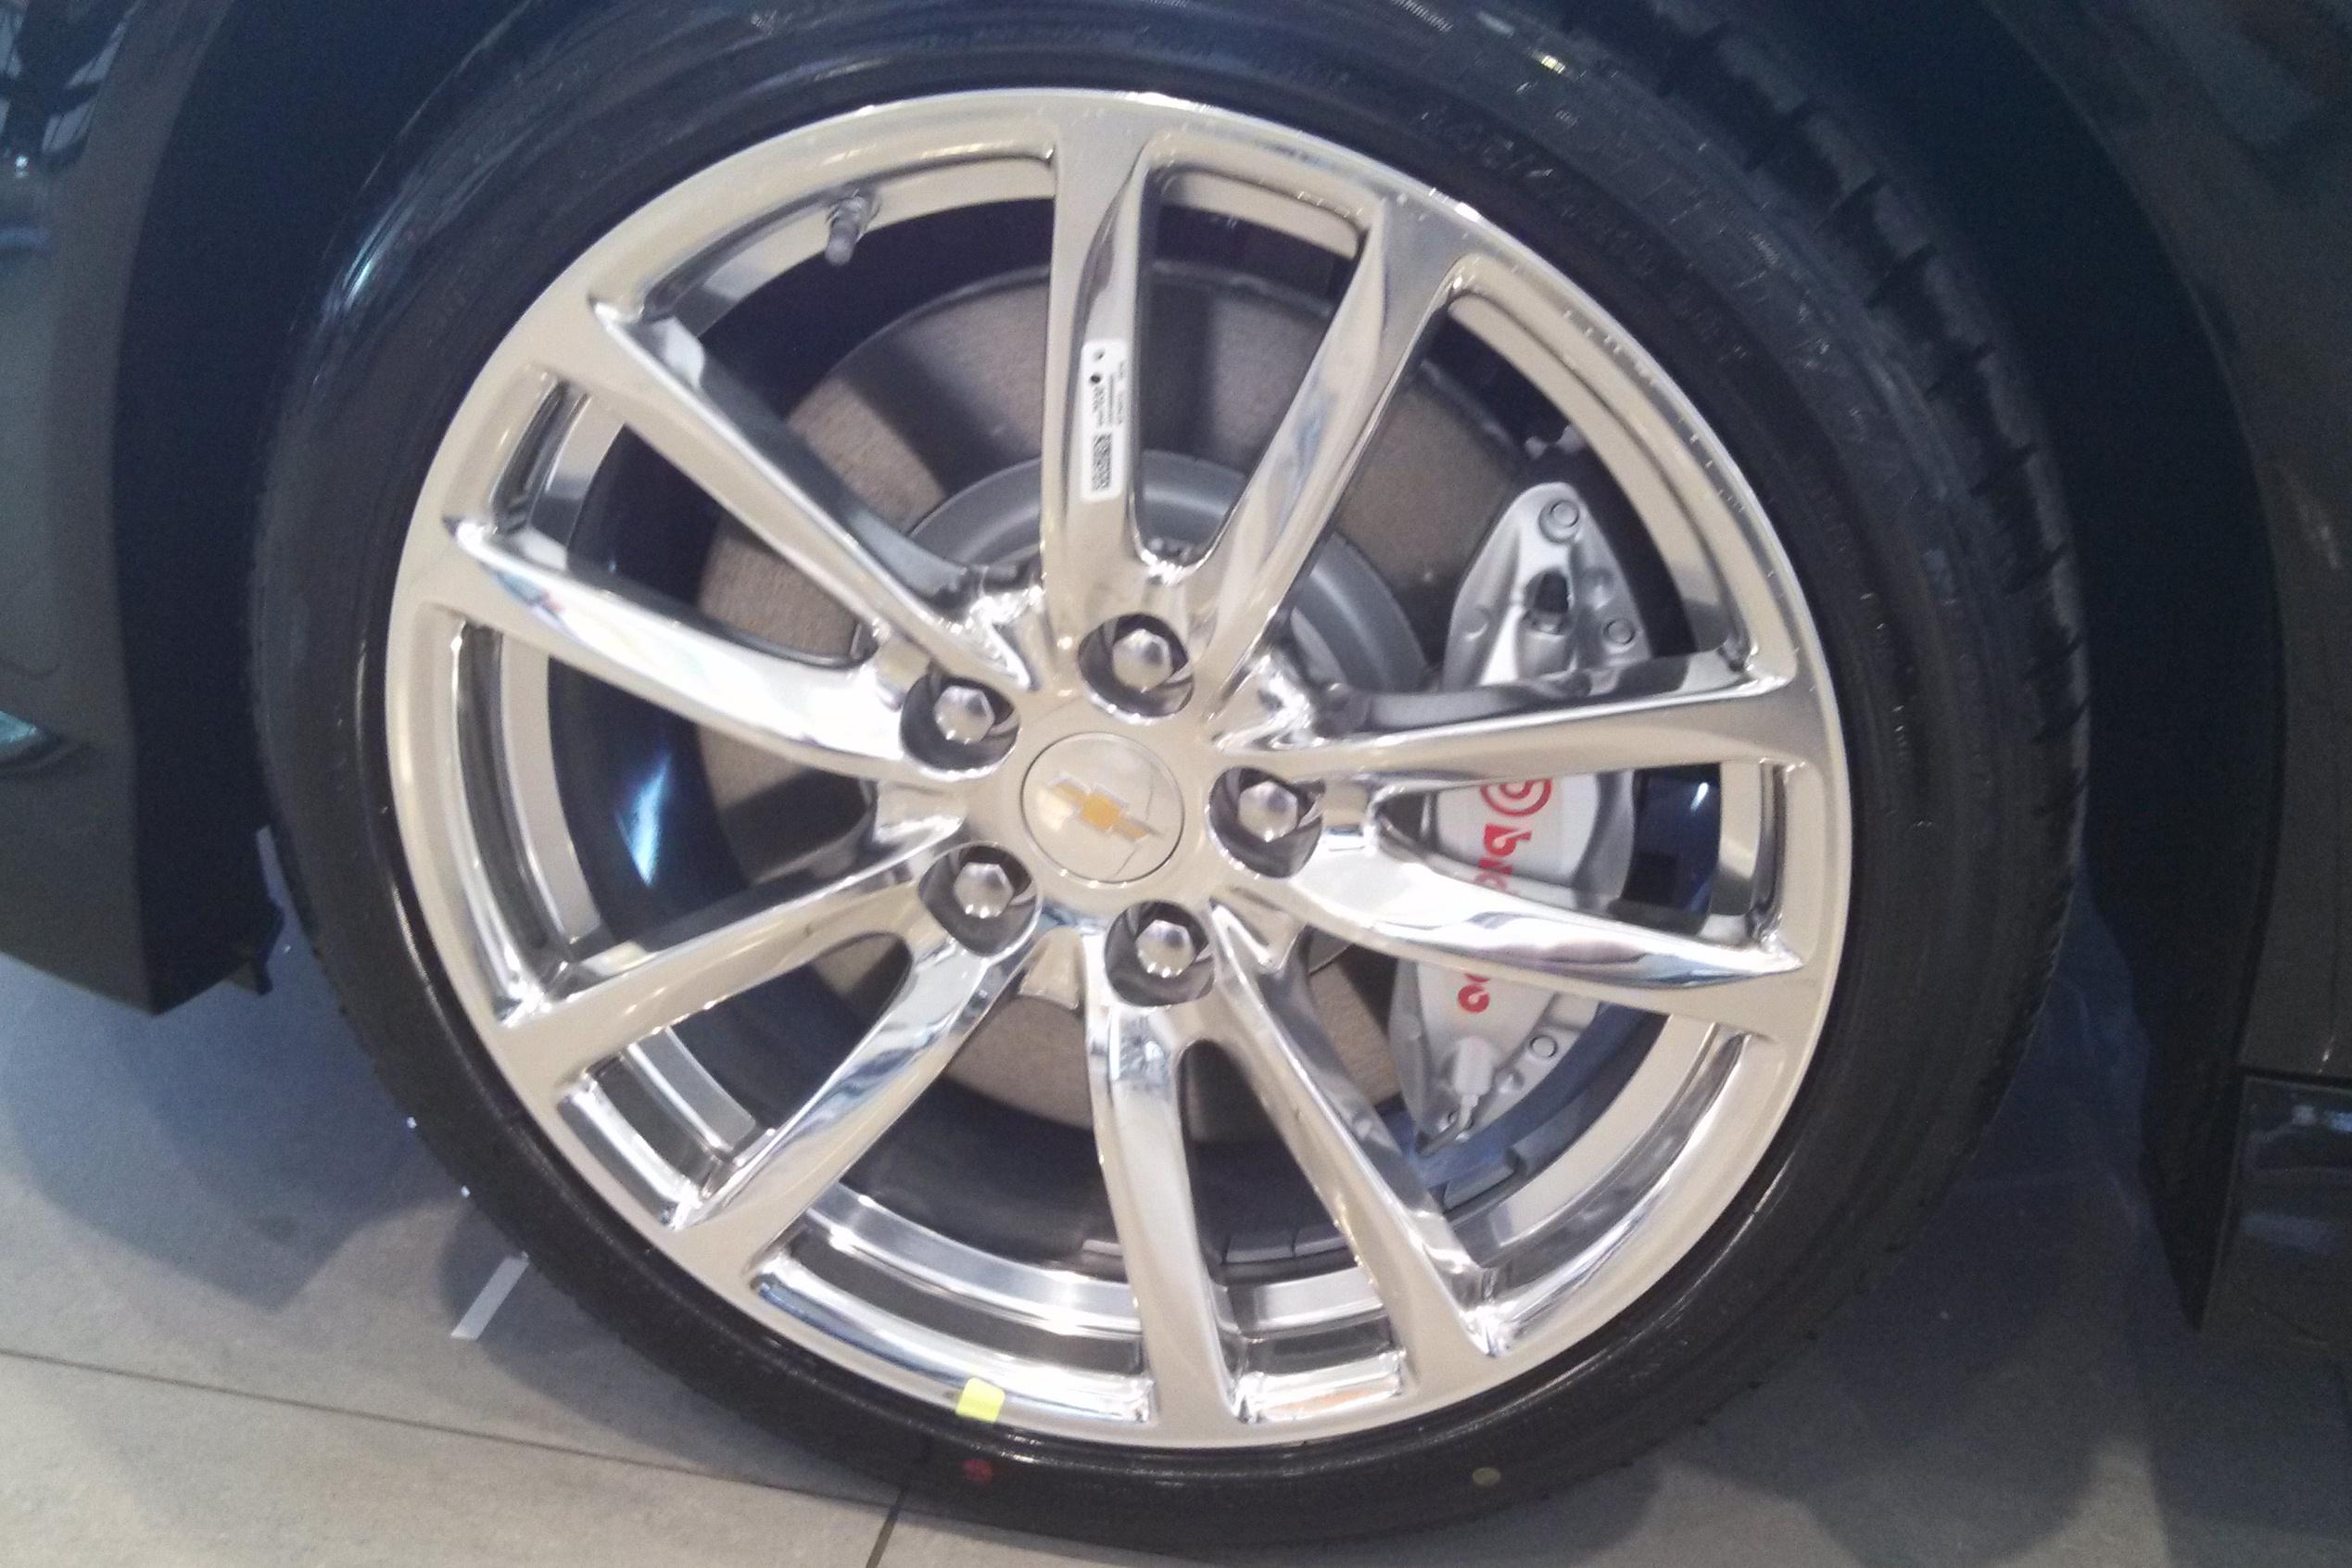 2014 Chevy Chevrolet Ss Sedan At Vandevere Chevrolet In